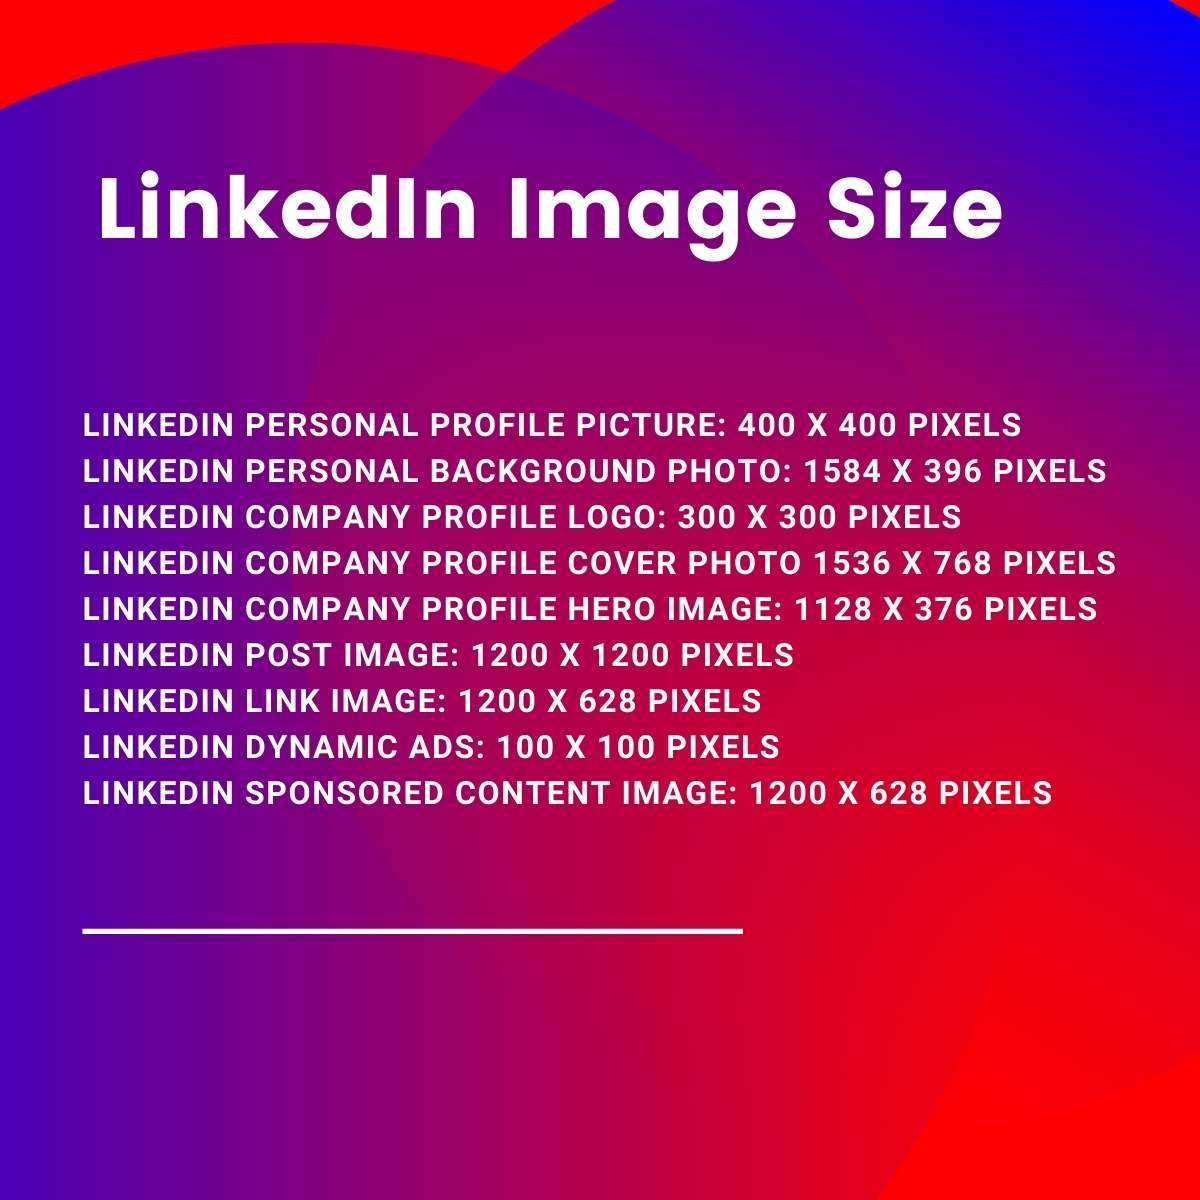 LinkedIn image size